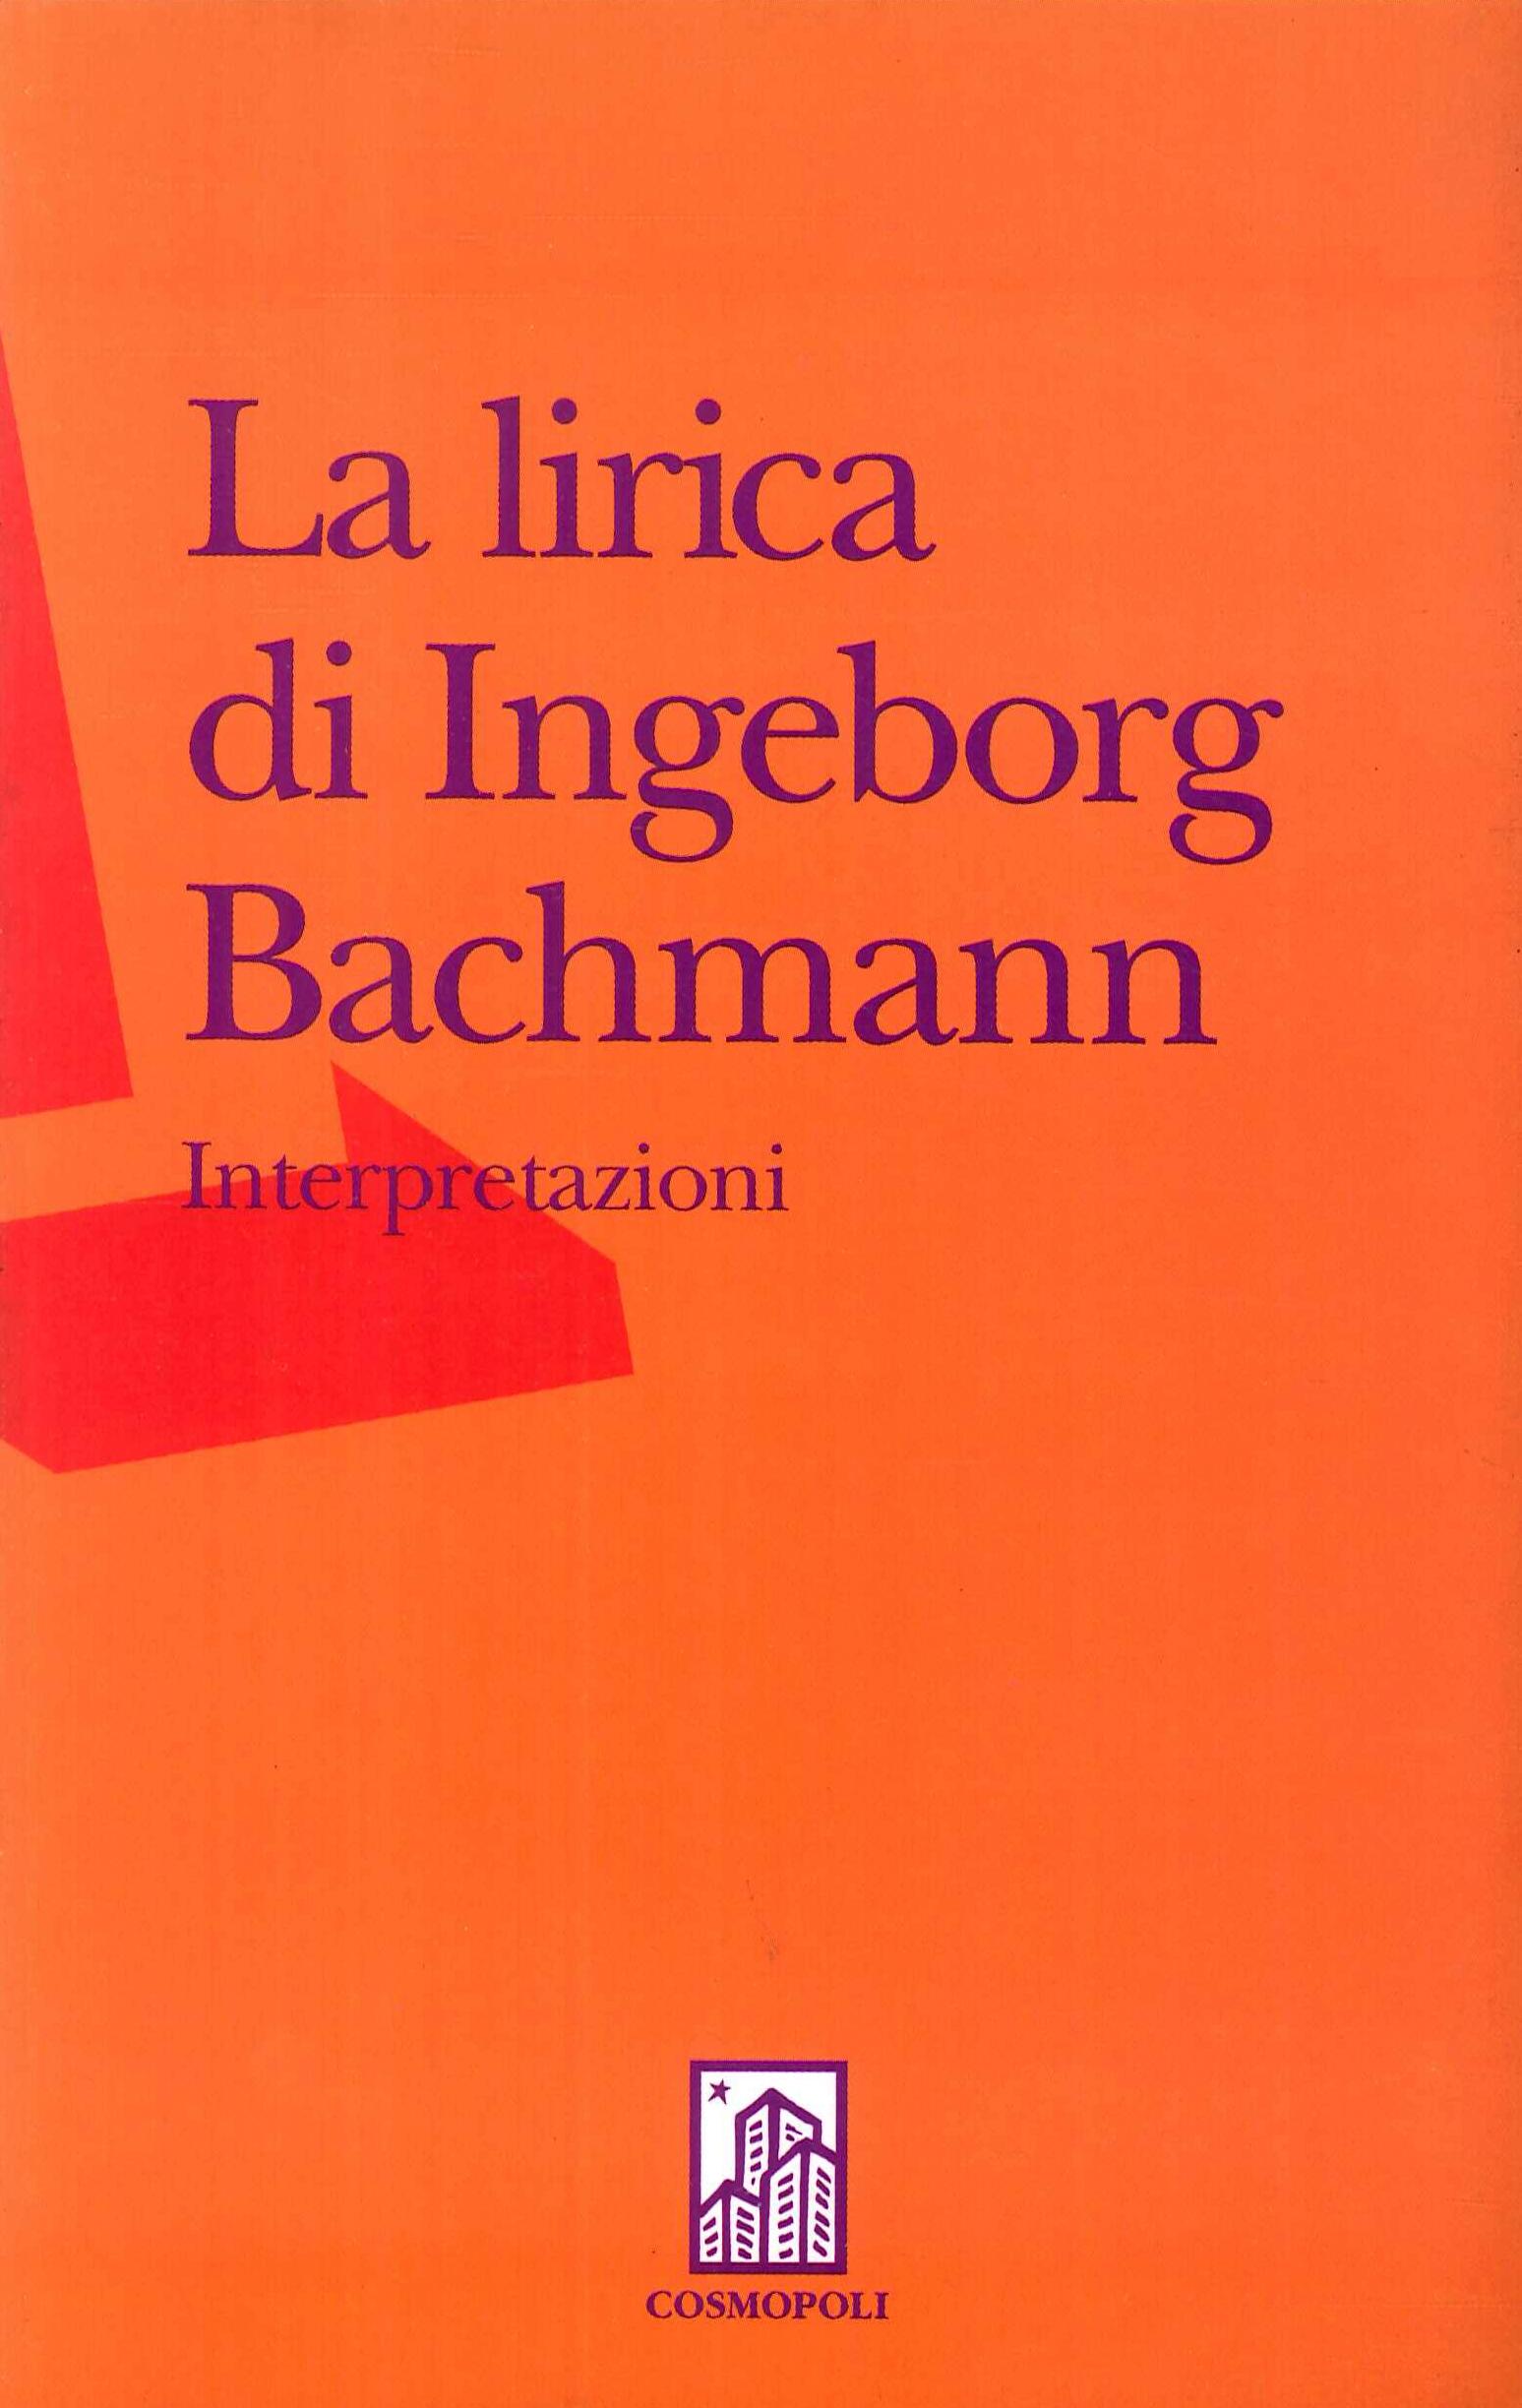 La lirica di Ingeborg Bachmann. Interpretazioni